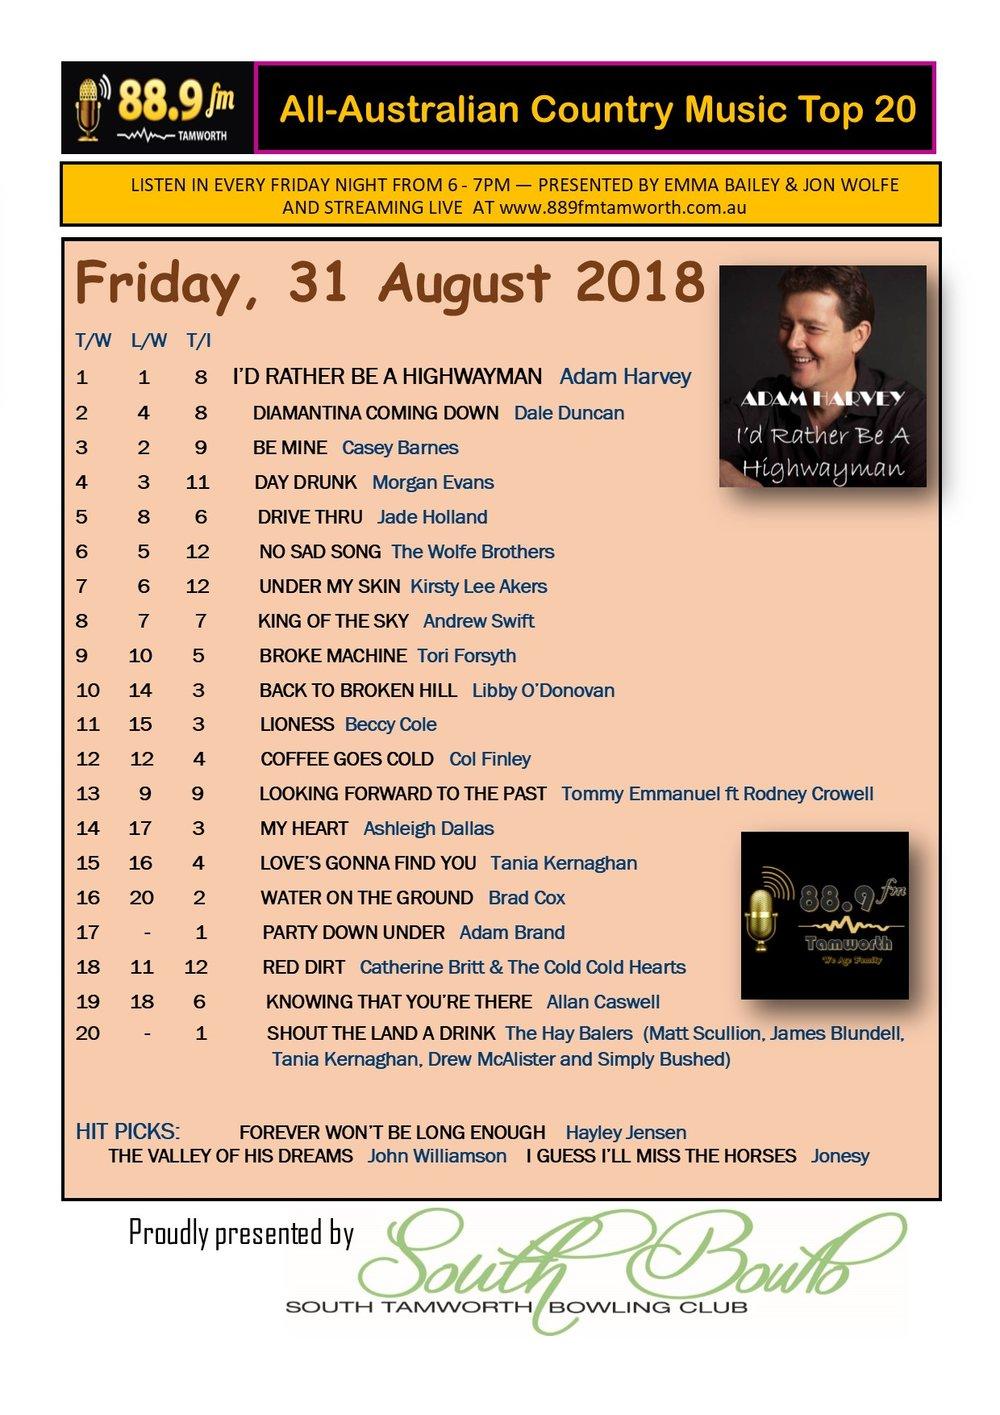 889FM CHART 31 August 2018.jpg